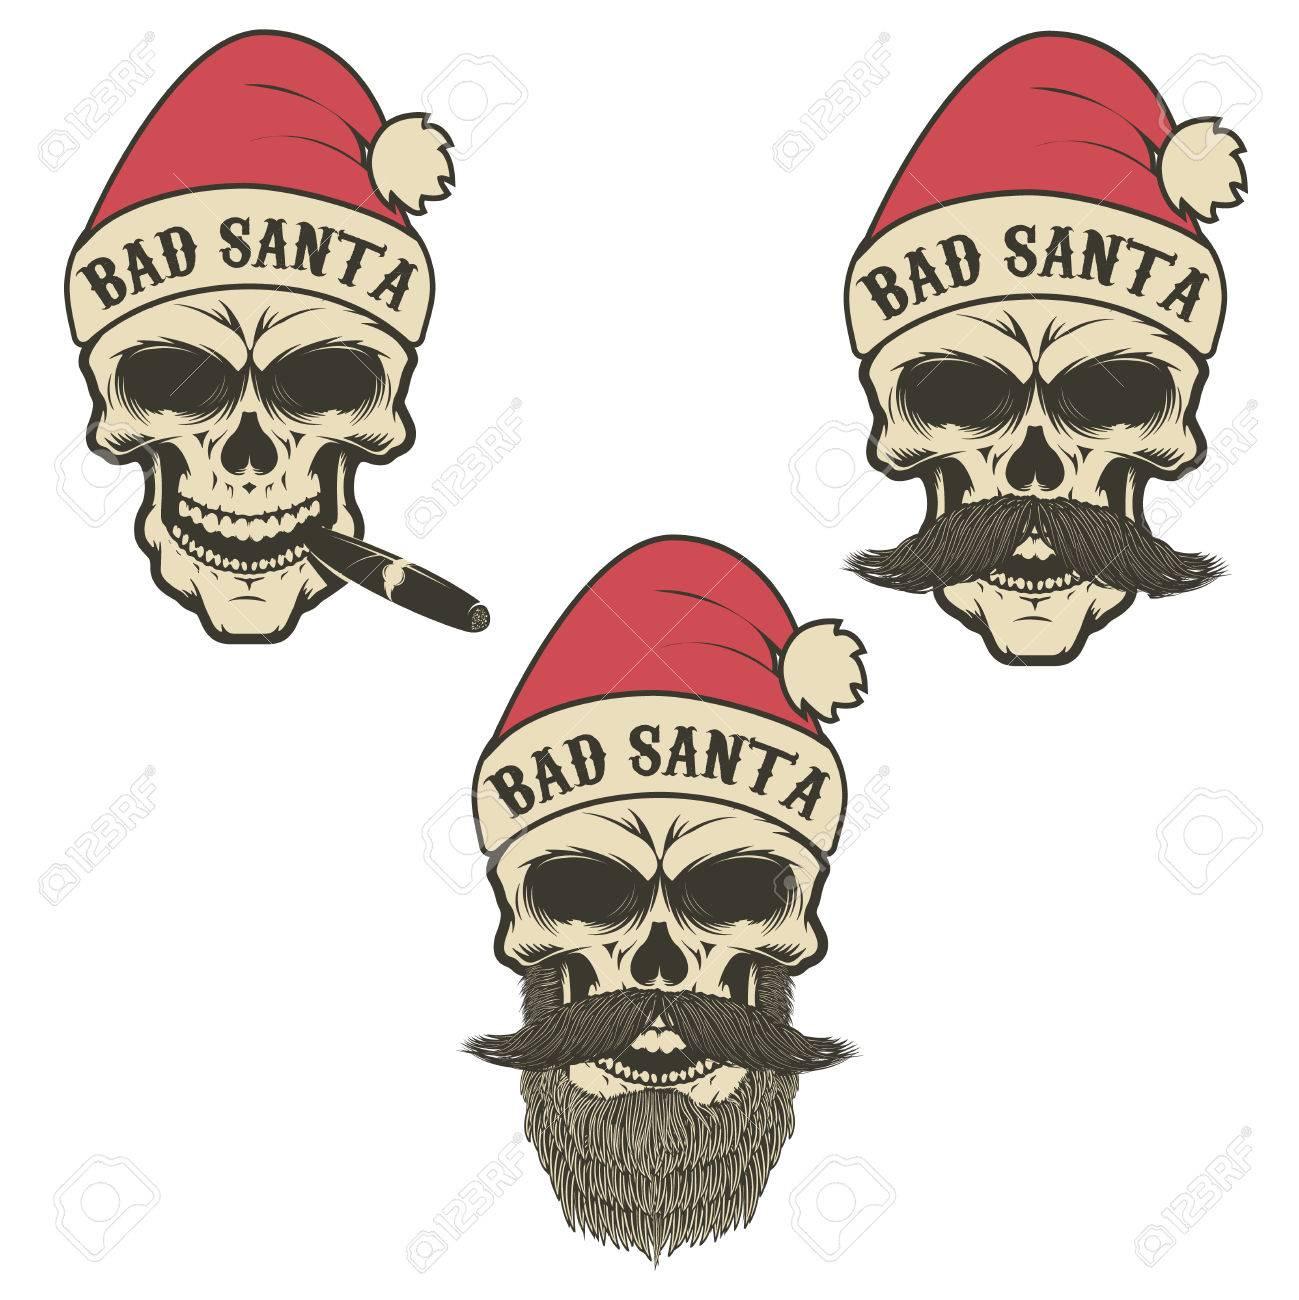 Bad Santa. Set Of Skulls In Santa Claus Hat With Beard 4a24b12f0b68